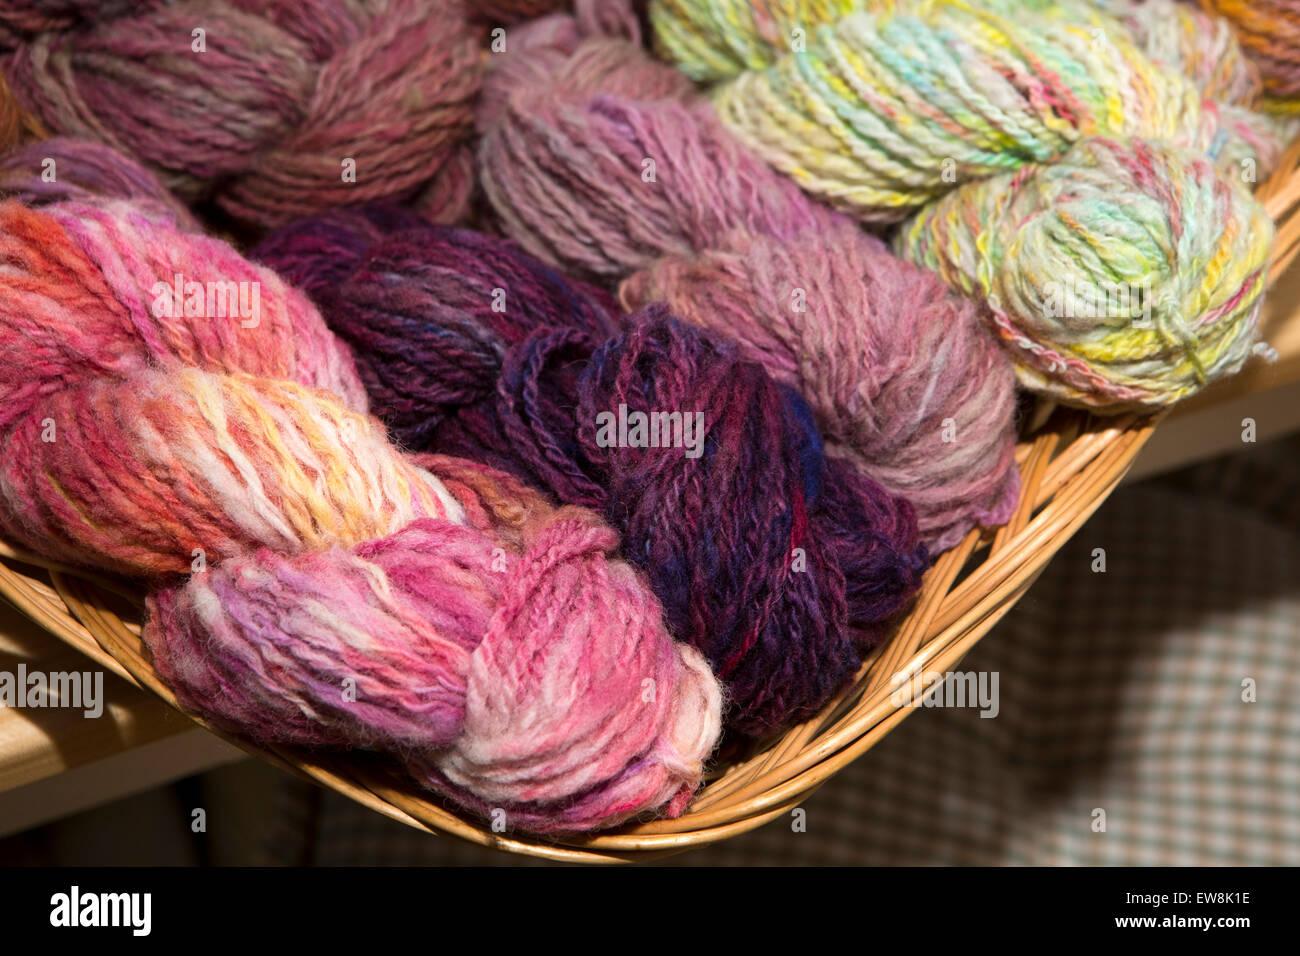 Ireland, Co Wexford, Enniscorthy, National 1798 Rebellion Centre, hand spun and dyed woollen yarn - Stock Image